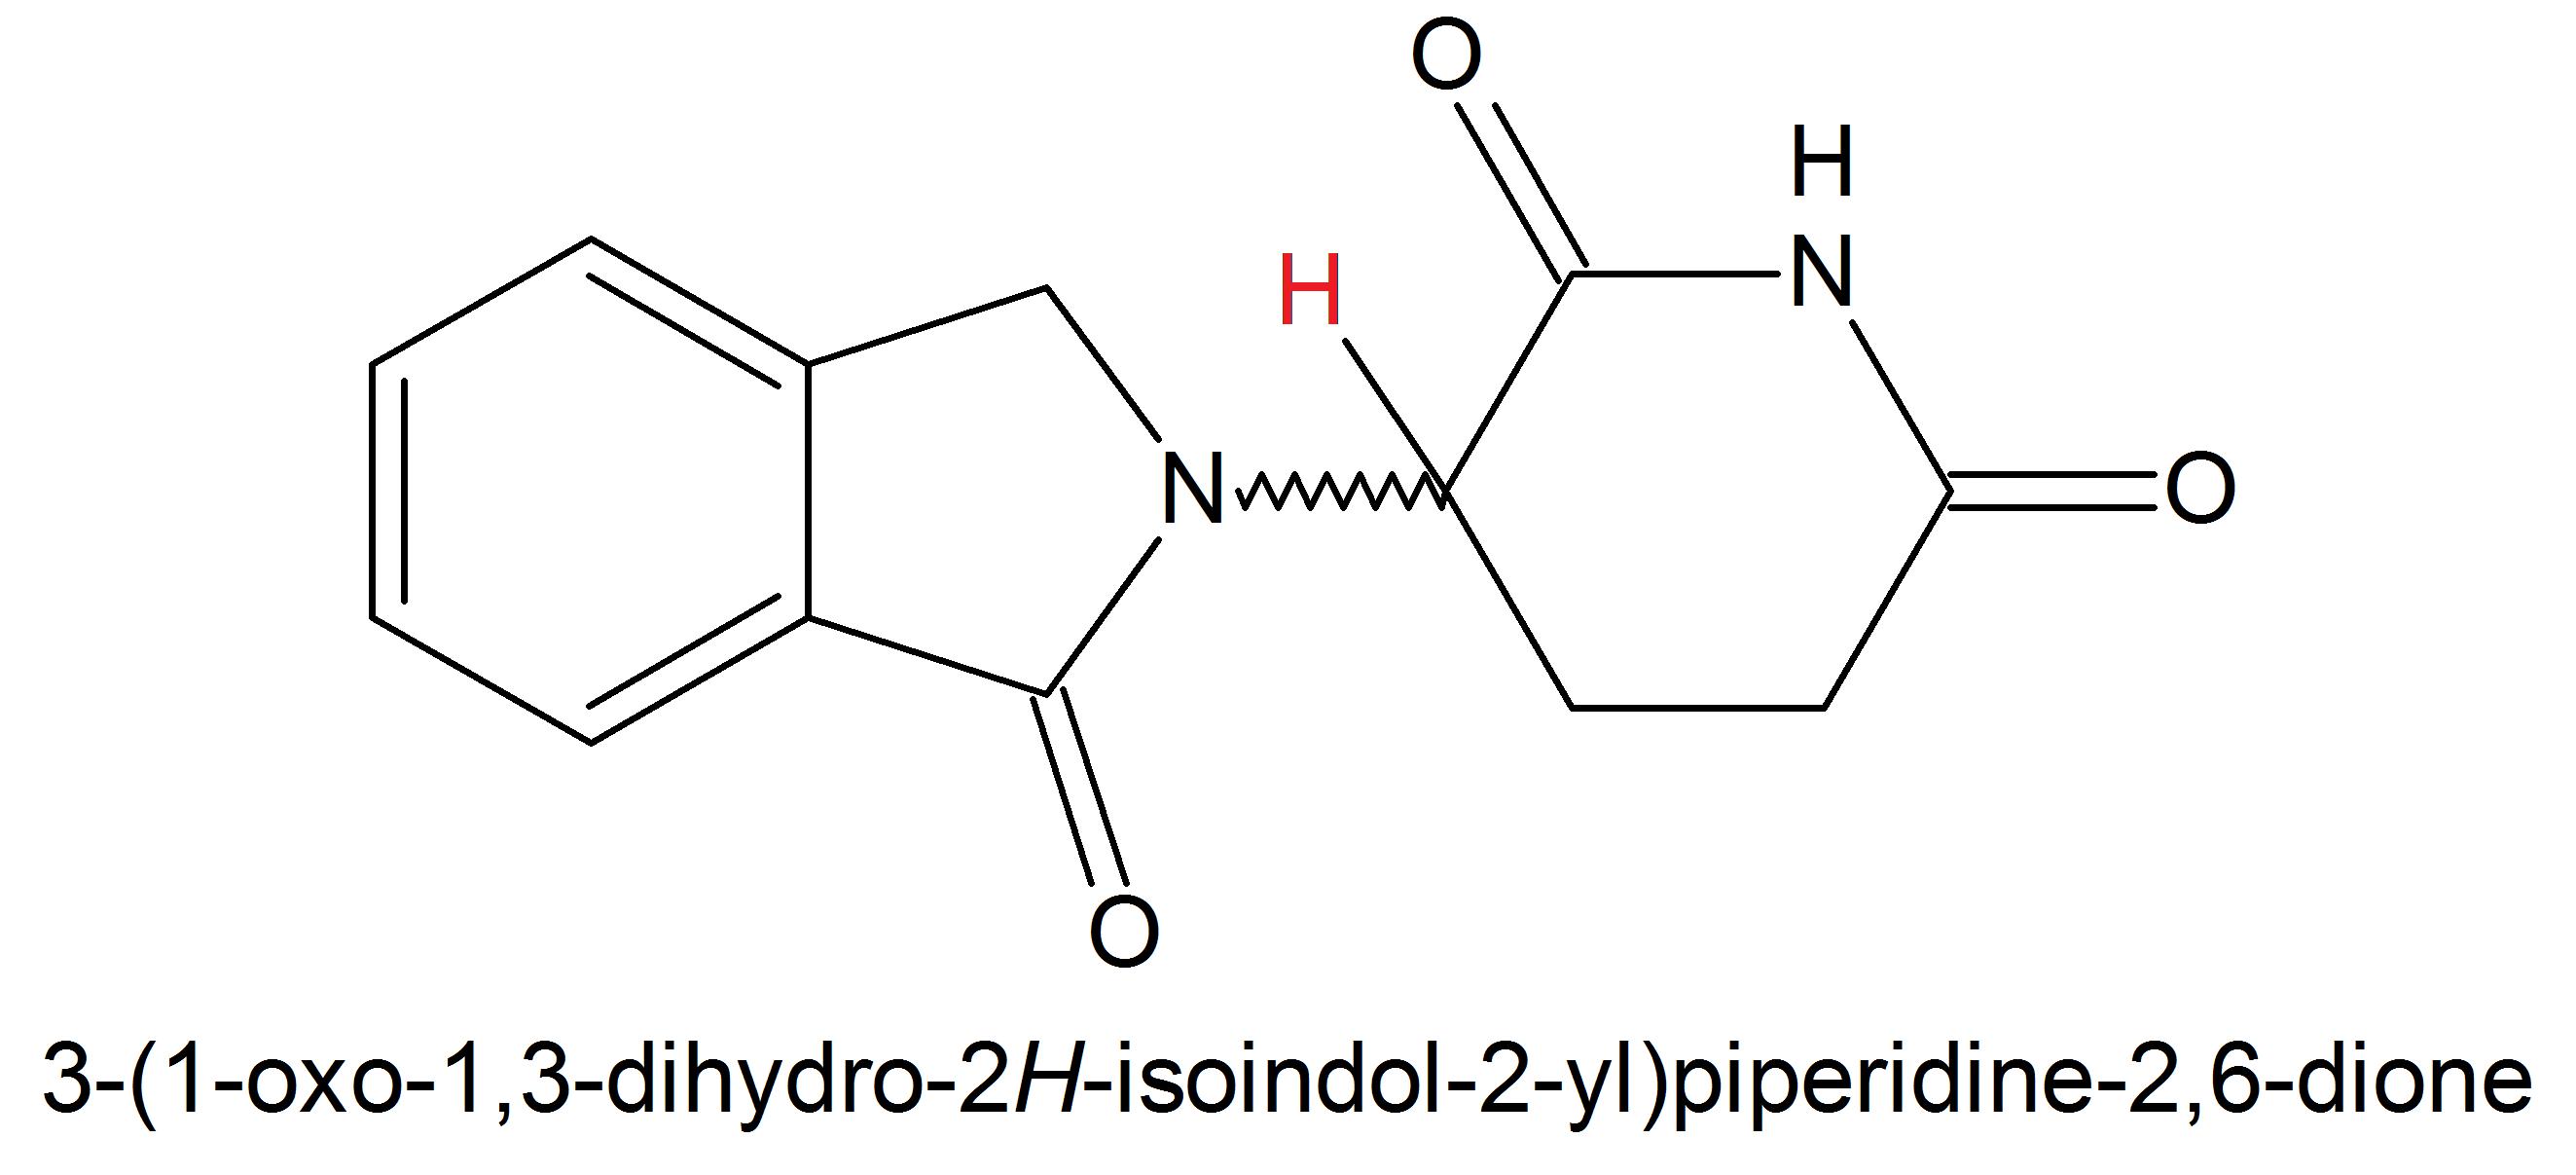 File:EM-12 structure highlighting the acidic hydrogen.png ... H2 Structural Formula